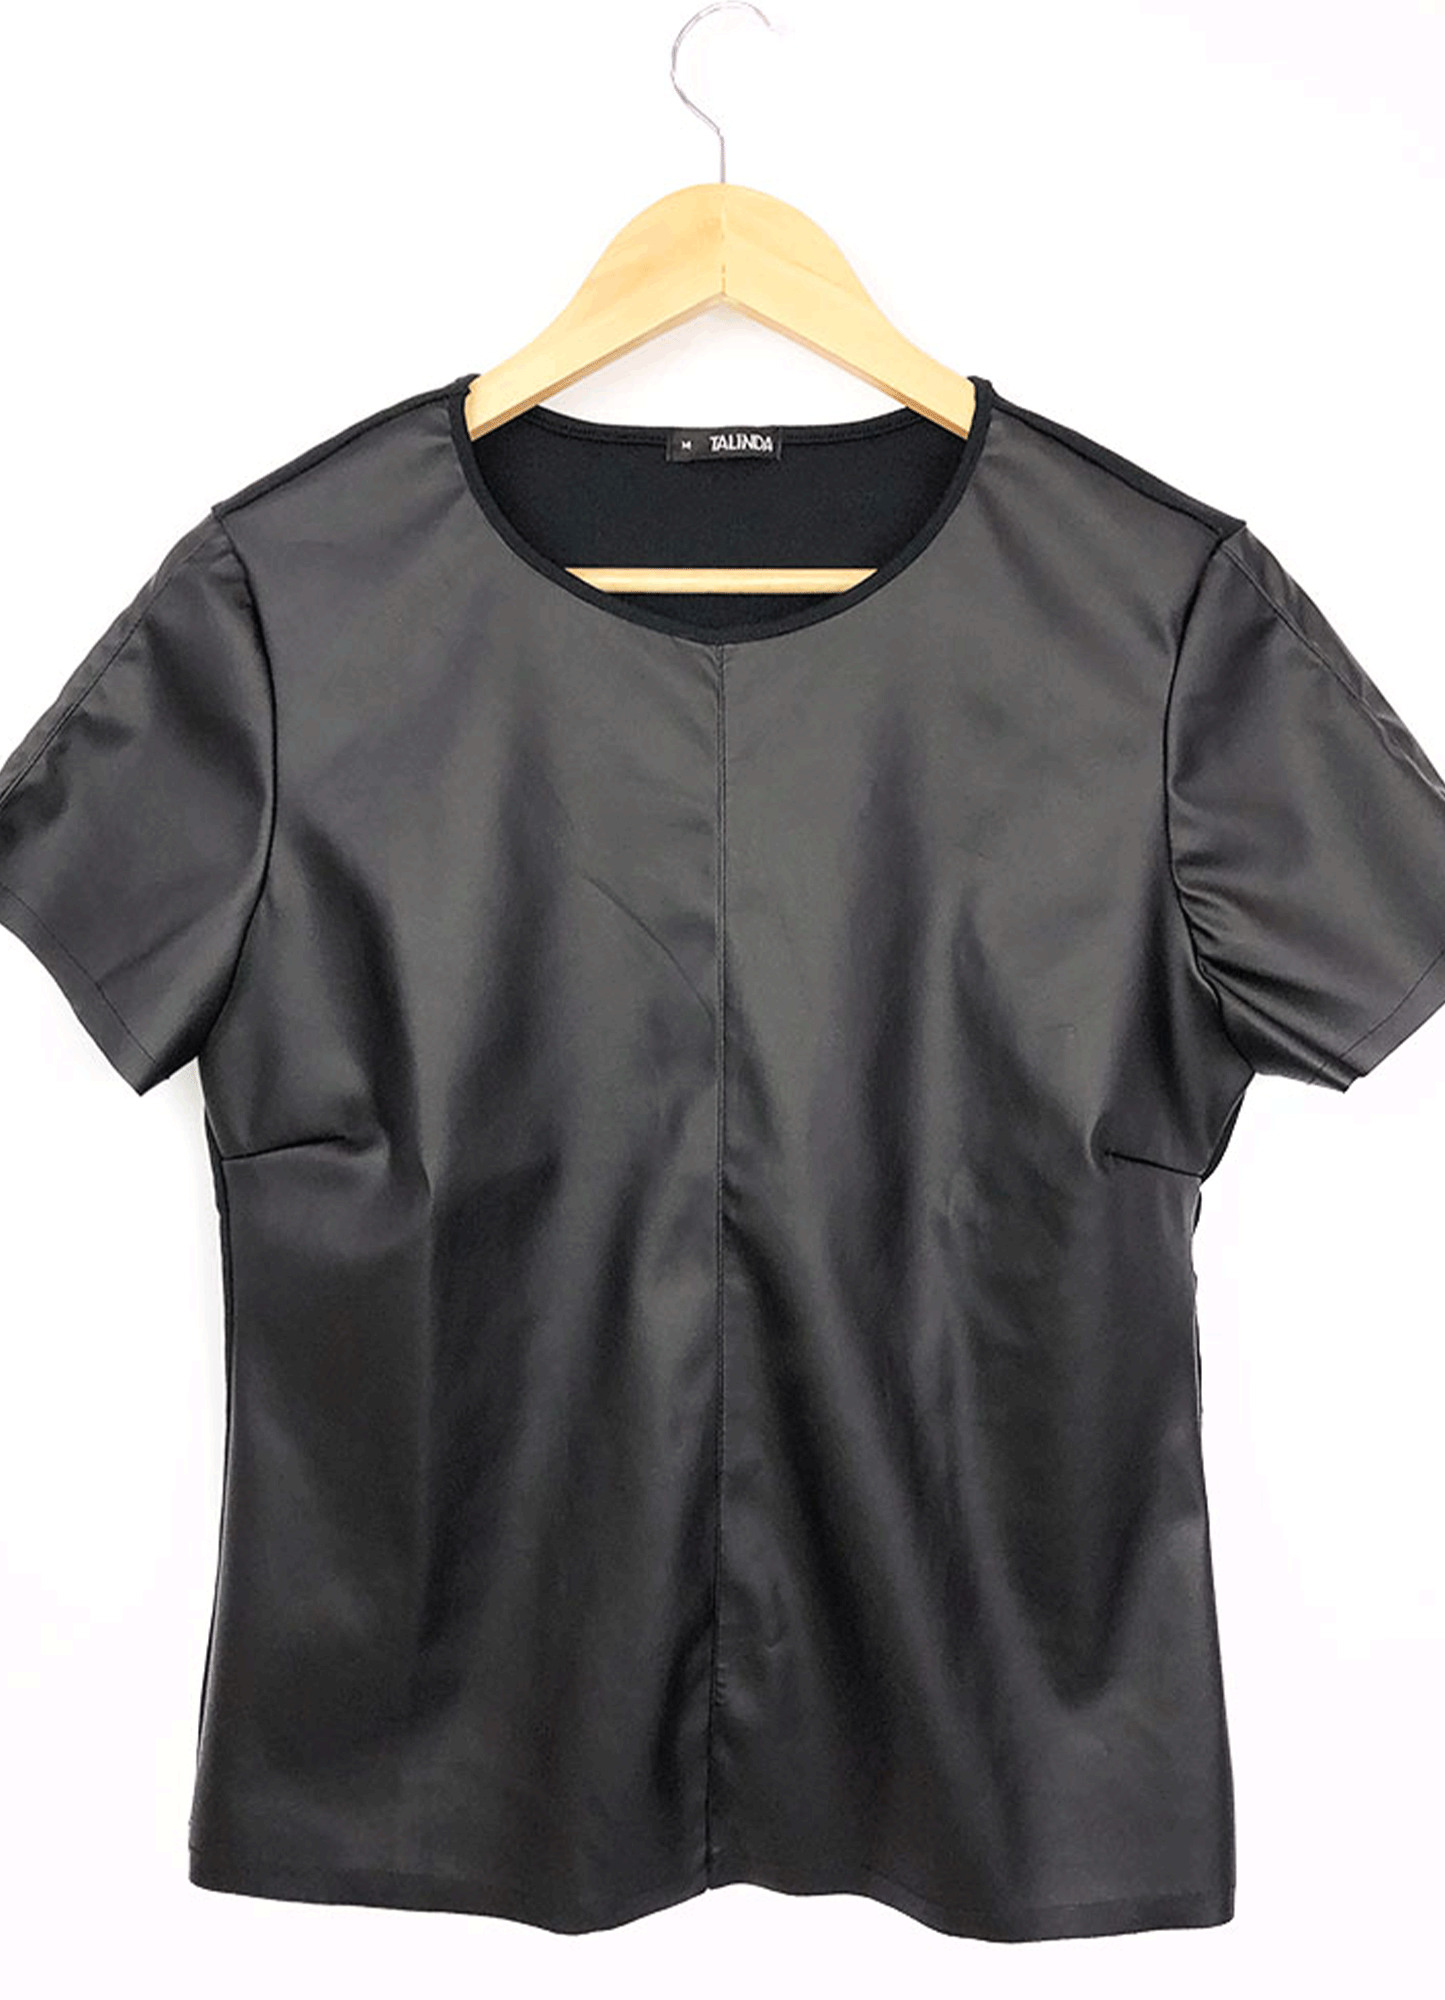 Blusa Feminina Frente Couro Costa Viscose Preta Decote Redondo